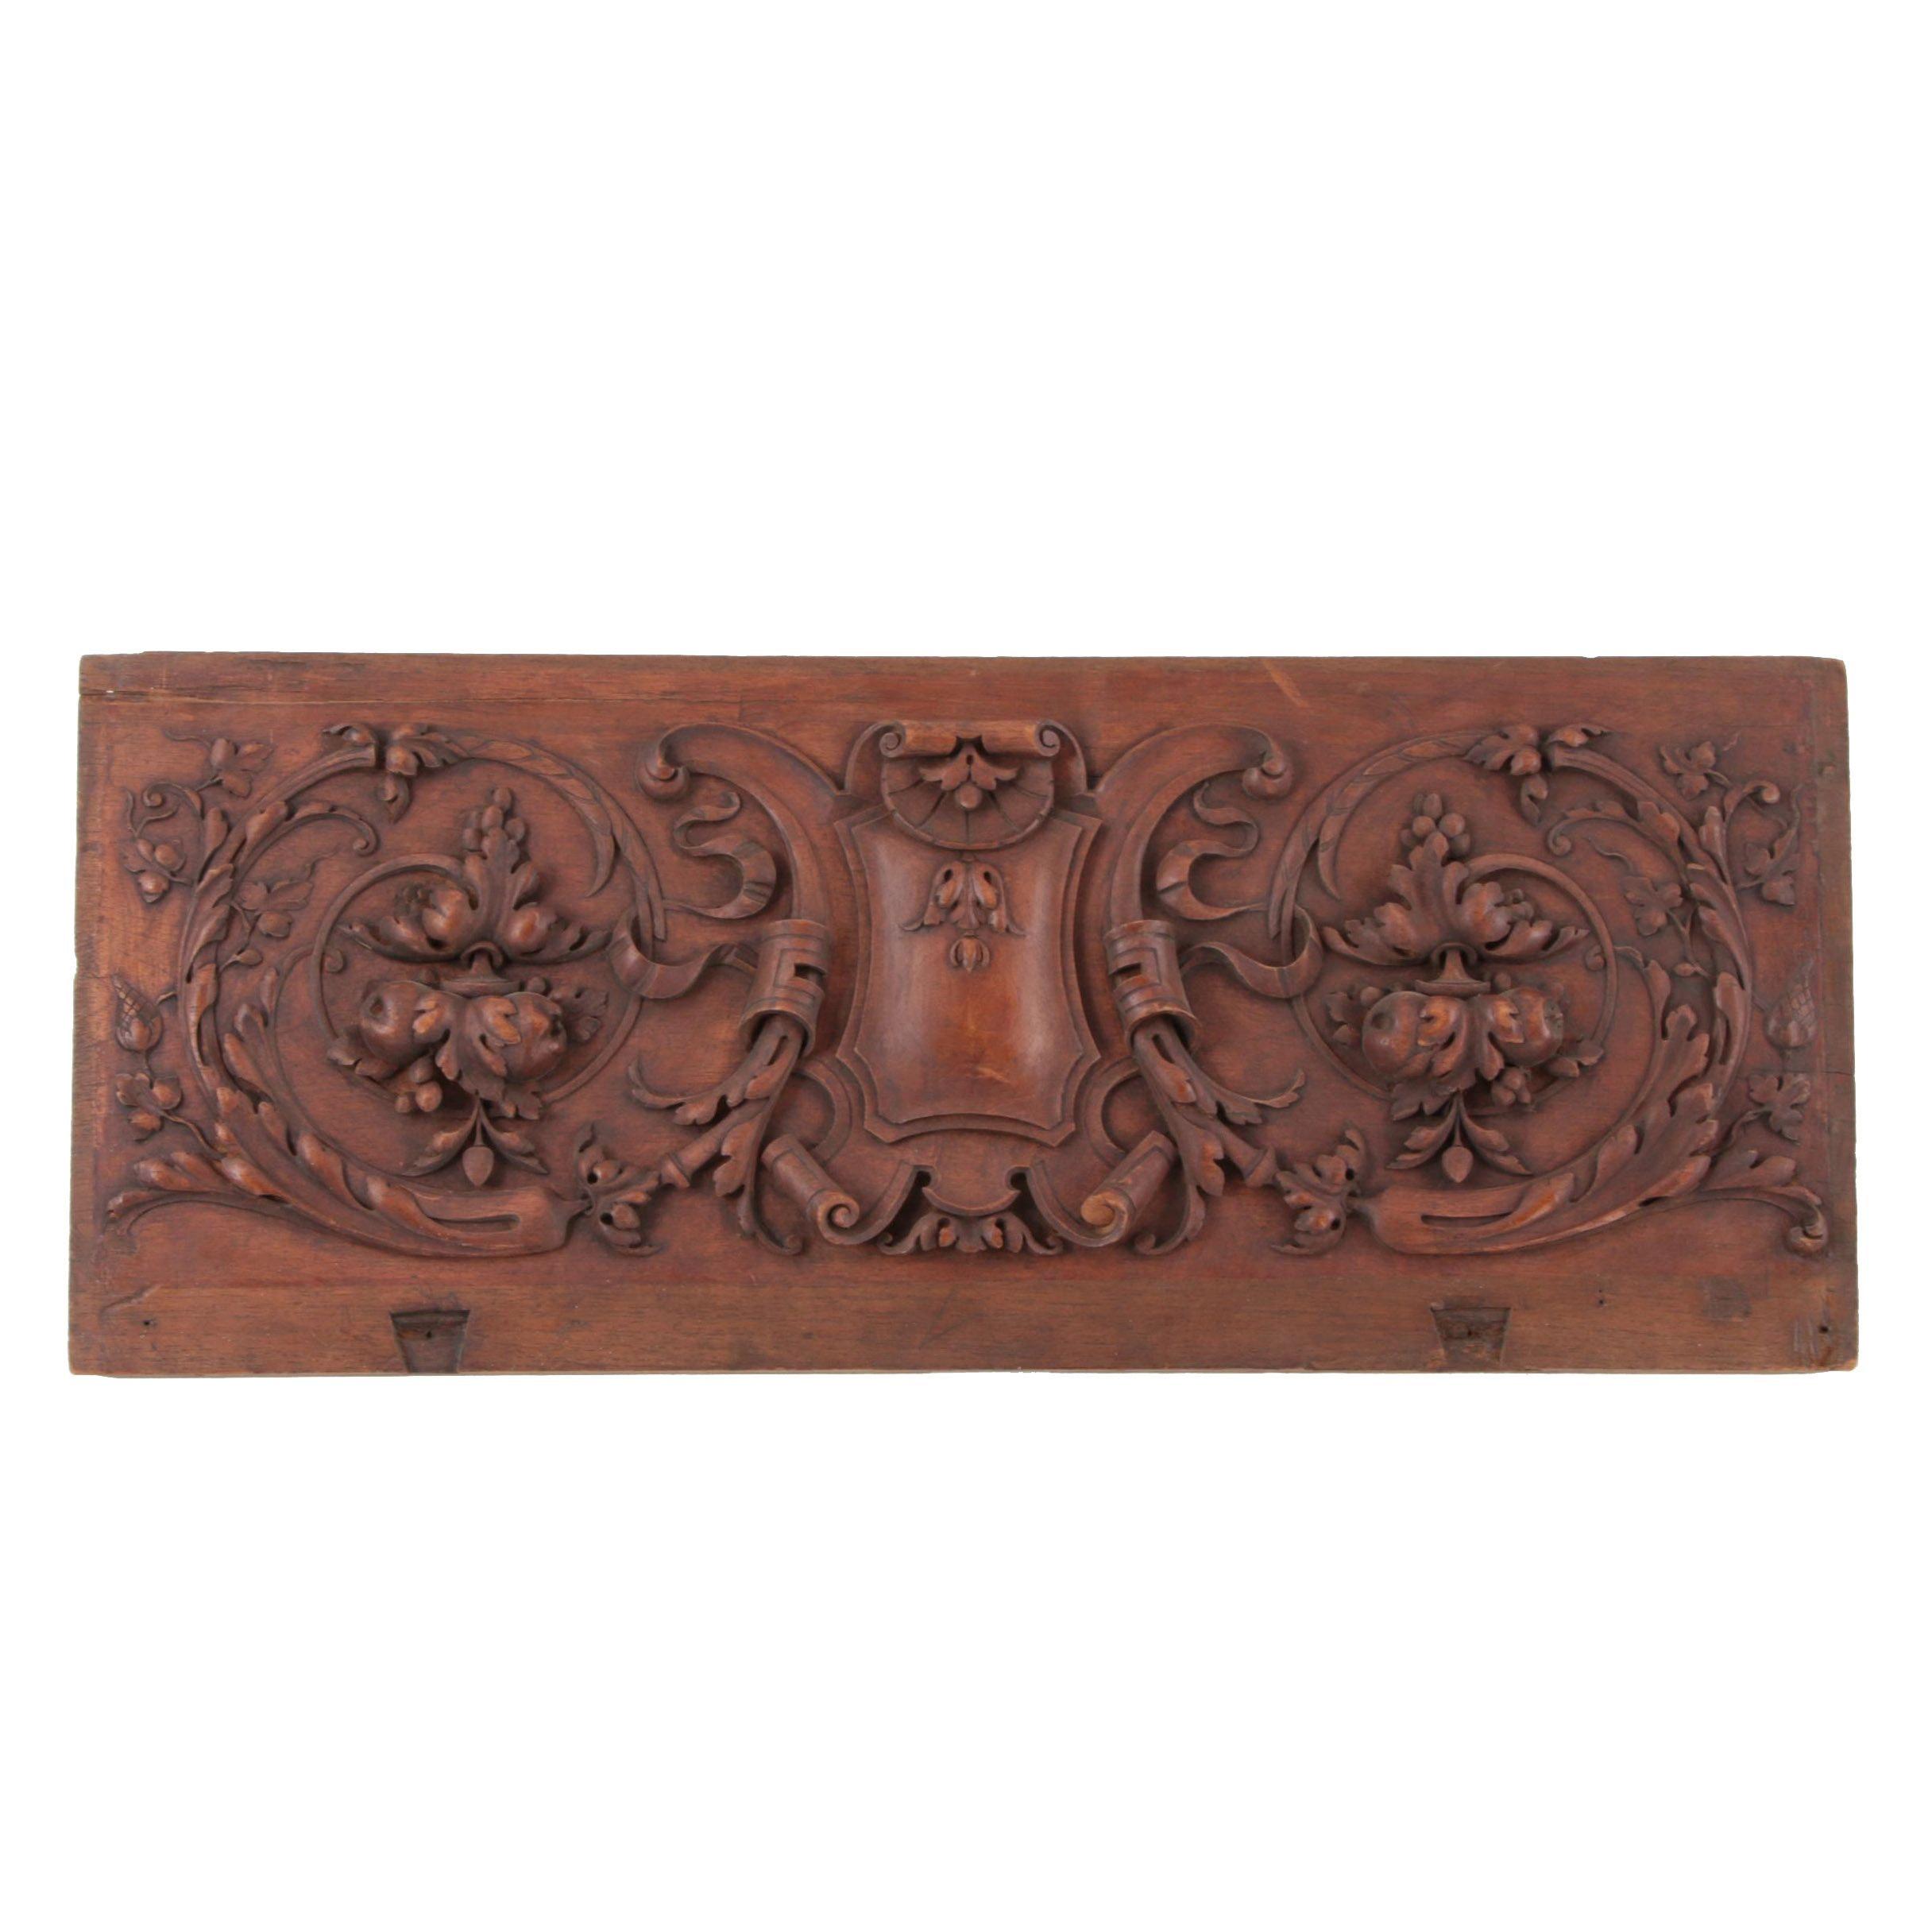 Victorian Renaissance Revival Relief-Carved Walnut Panel, Circa 1880